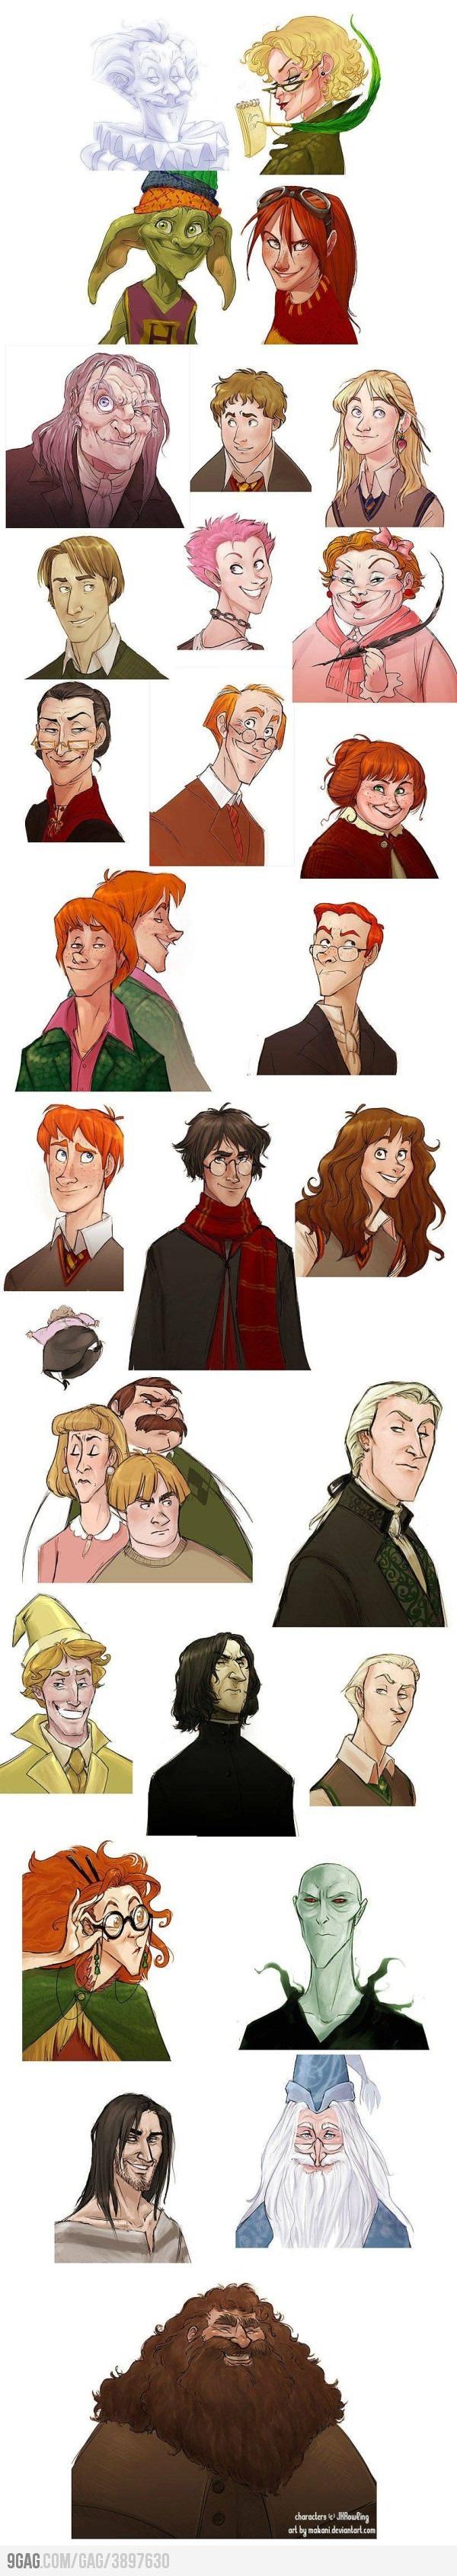 Makani's 'widget' Harry Potter characters (originally from acciobrain.ligermagic.com)